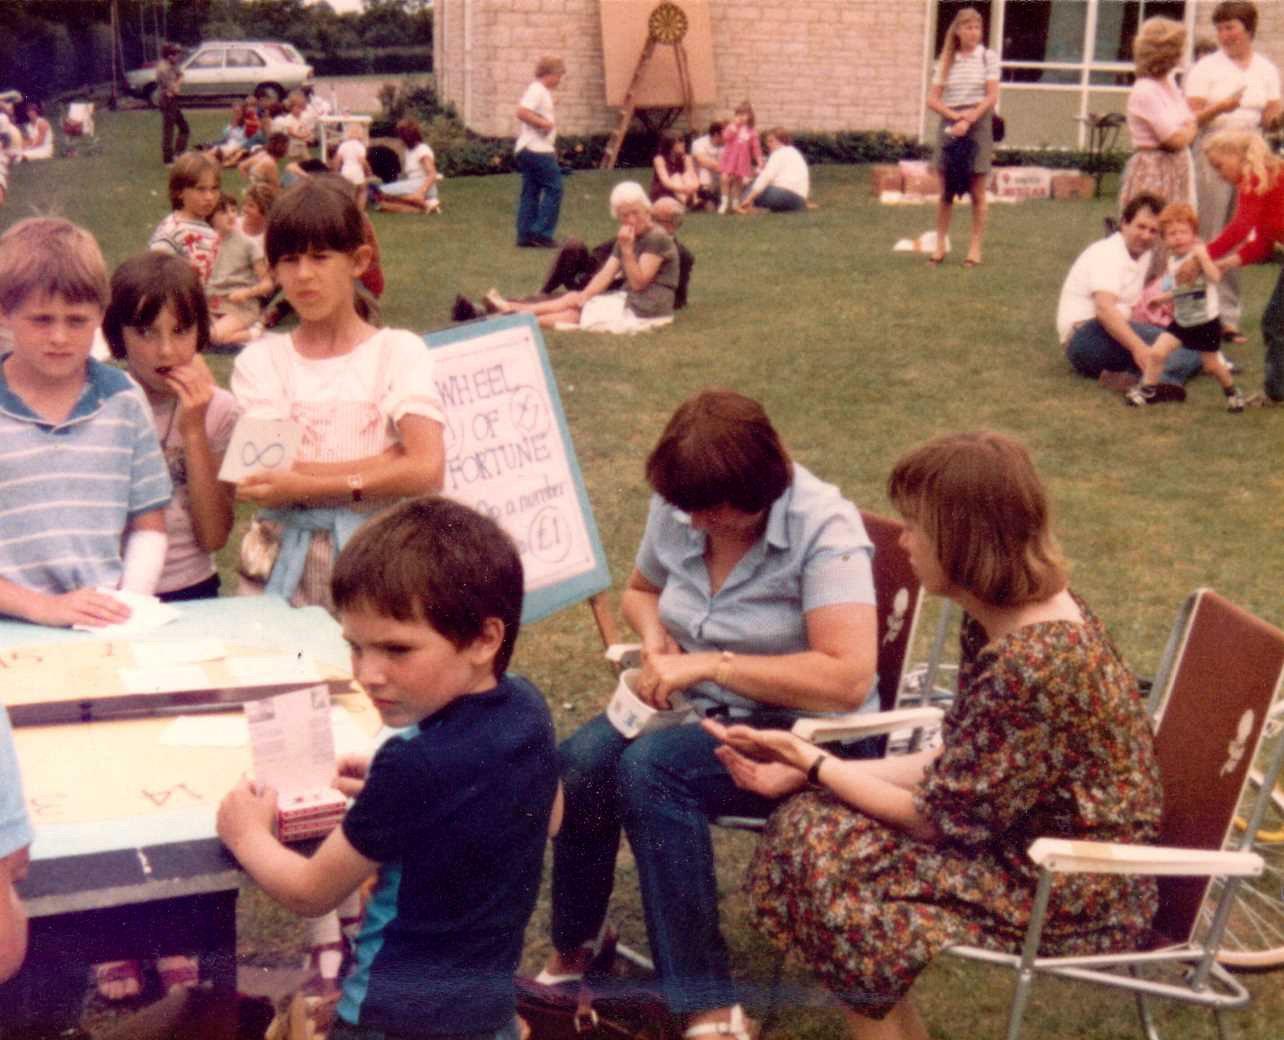 c. 1980 Middle Barton School Fete. Jamie Edbury, Tanya Southam, Tamsin Blencoe, Luke Morgan. Unknown. Teacher sitting on right is Mary Barker.